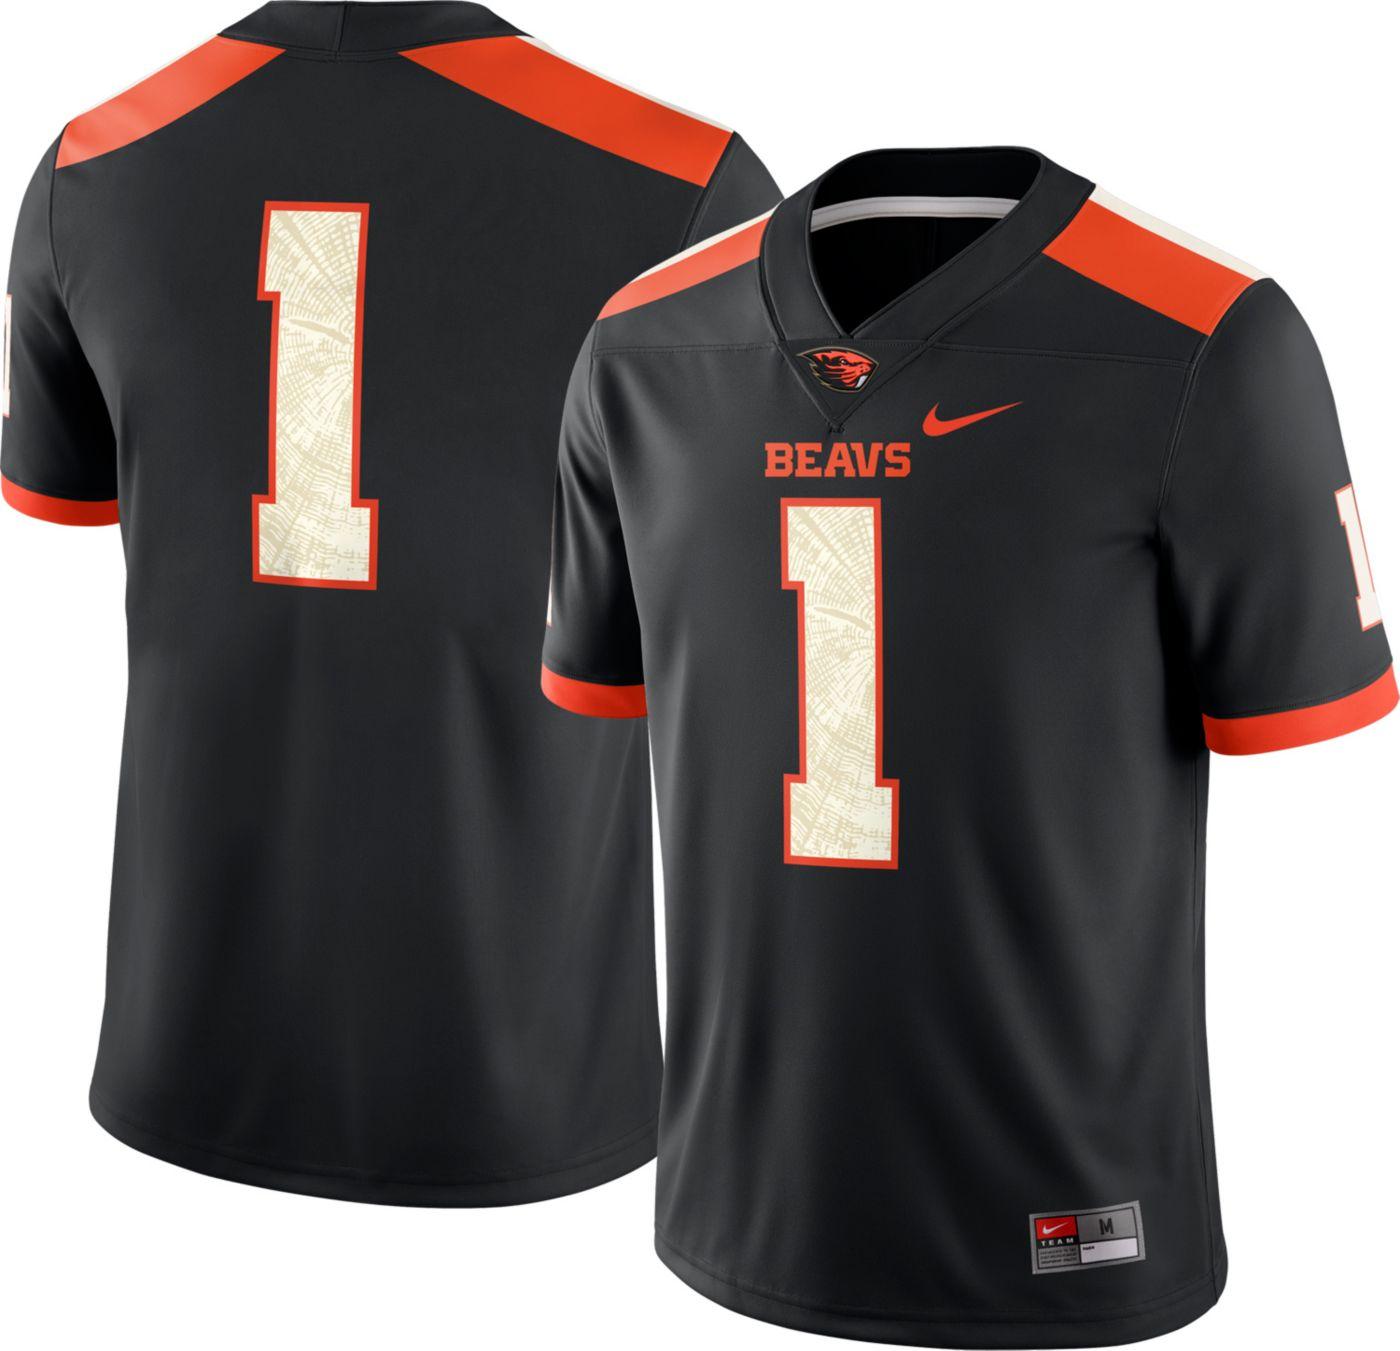 Nike Men's Oregon State Beavers #1 Dri-FIT Game Football Black Jersey